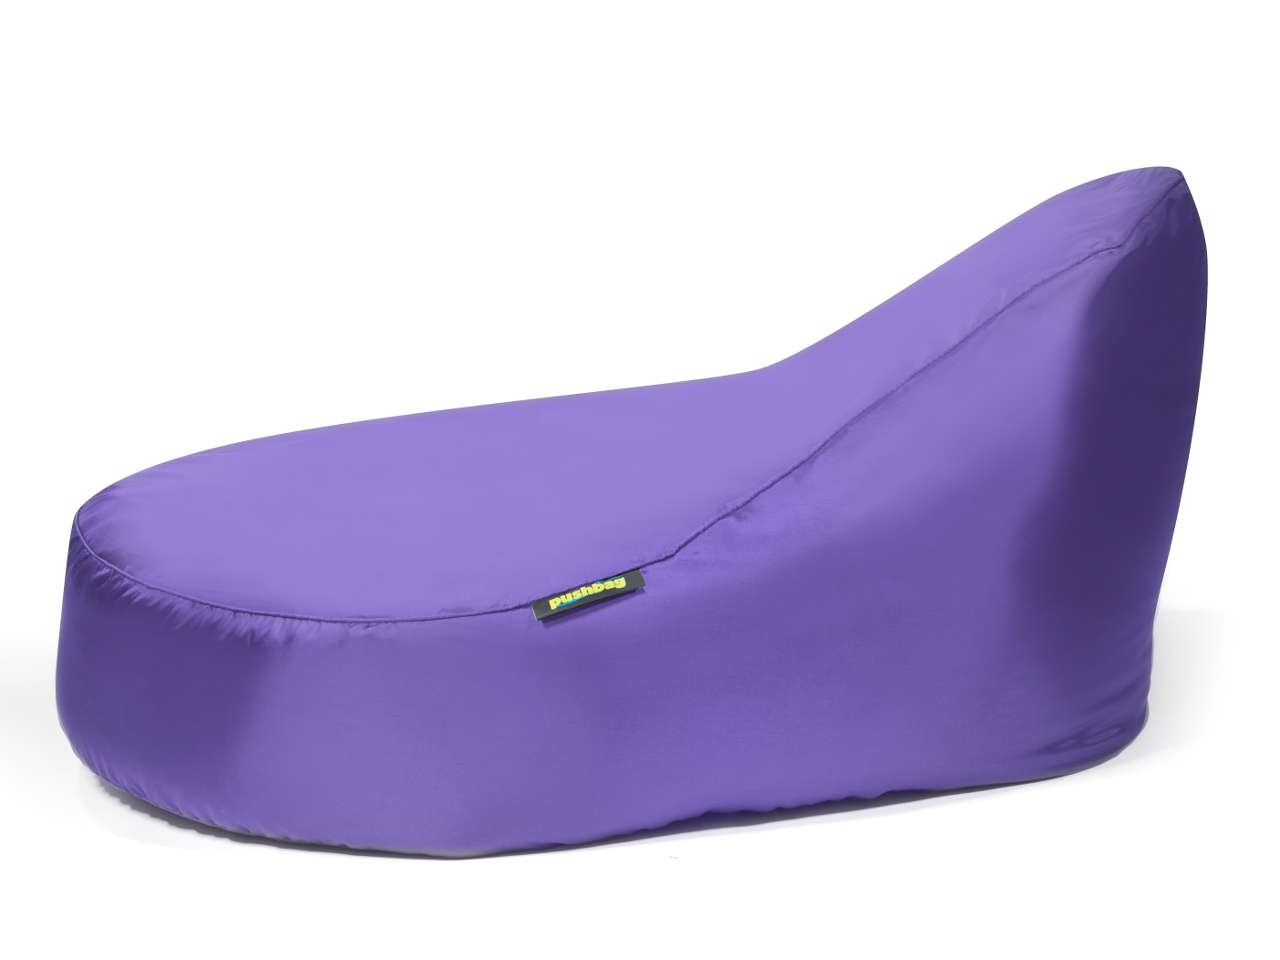 Pushbag Indoor Sitzsack Seat XL 11-SEAX-OX-purple oxford purple